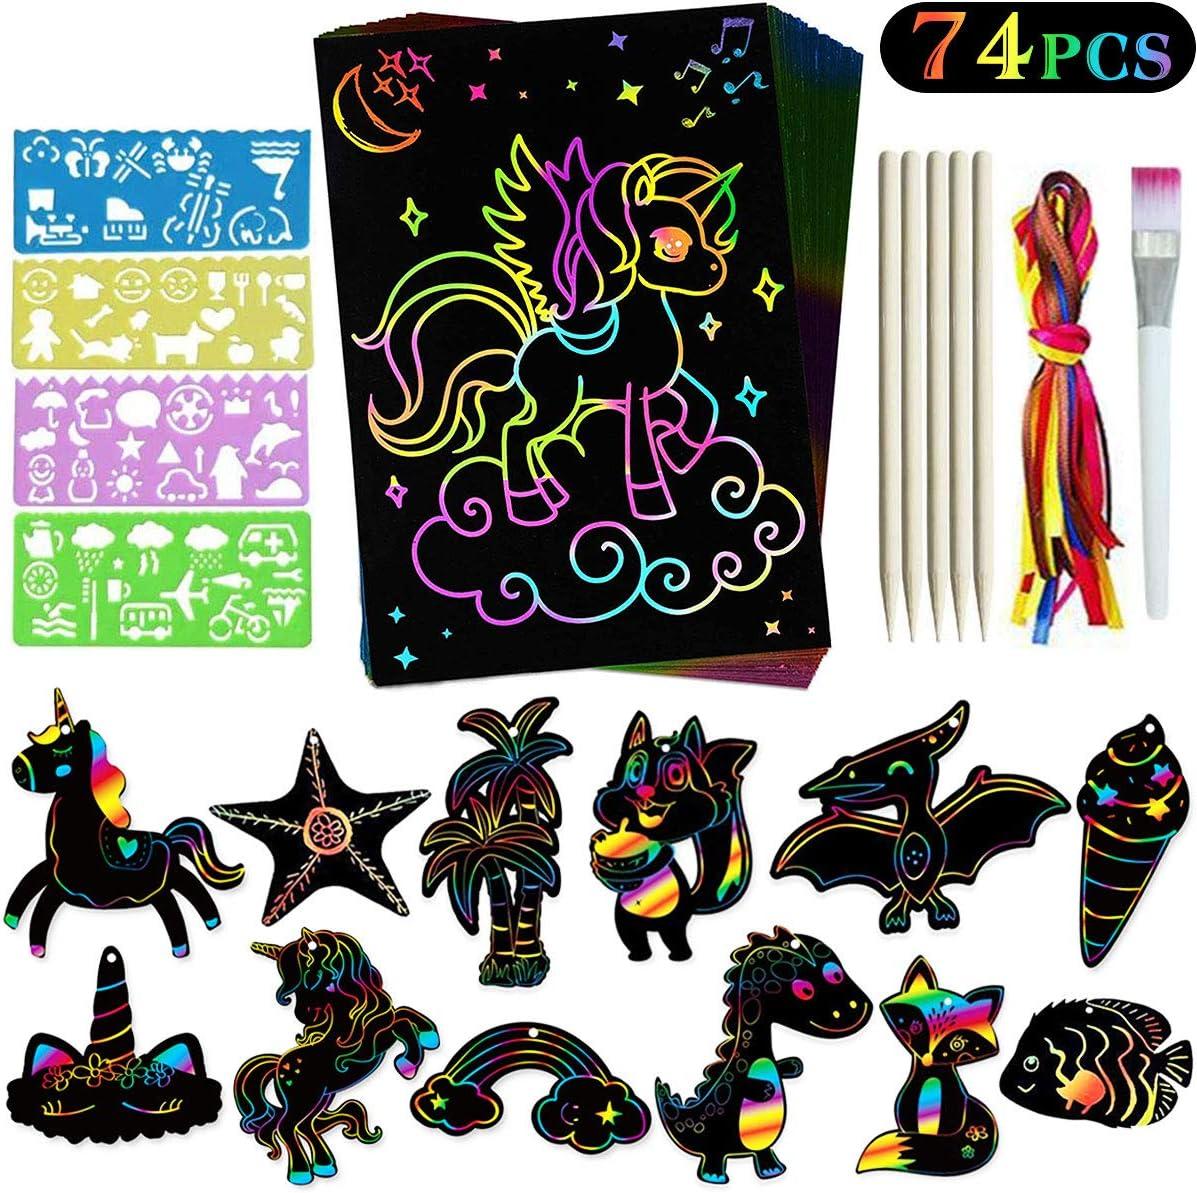 Yegrape Scratch Art Set for Kids Rainbow Classroom School Supplies Birthday Party Favors Game Crafts Gift for Children Girls Boys 36 Pcs Rainbow Magic Scratch Paper Art Supplies Decoration